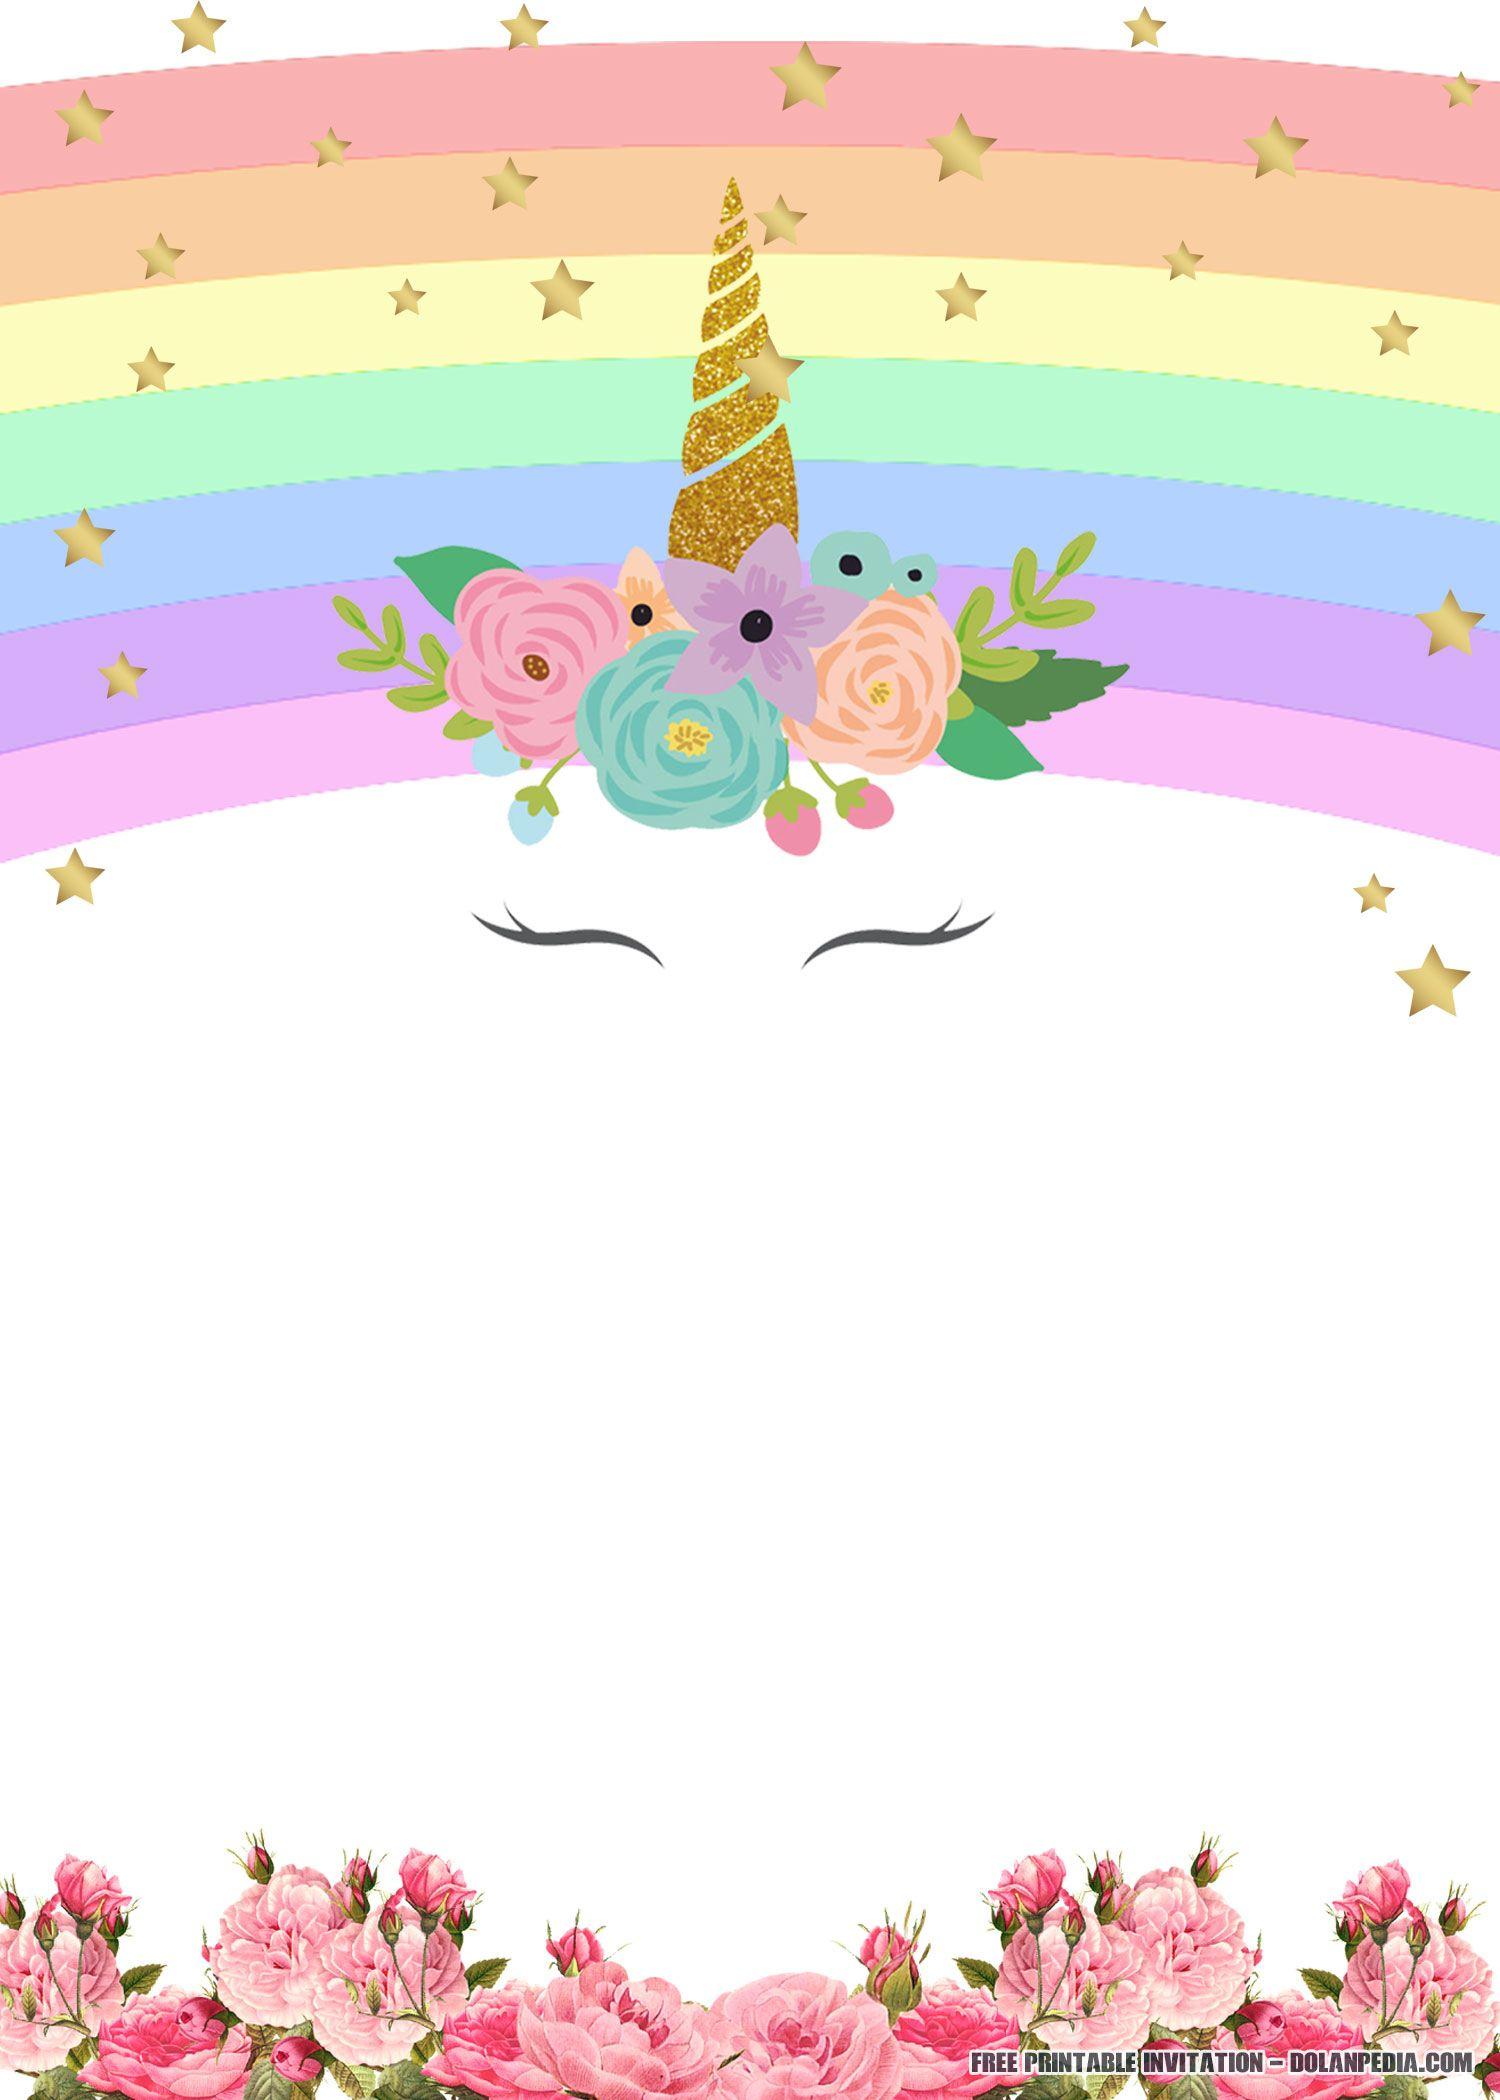 Free Printable Golden Unicorn Birthday Invitation | Unicorn - Free Printable Unicorn Birthday Invitations